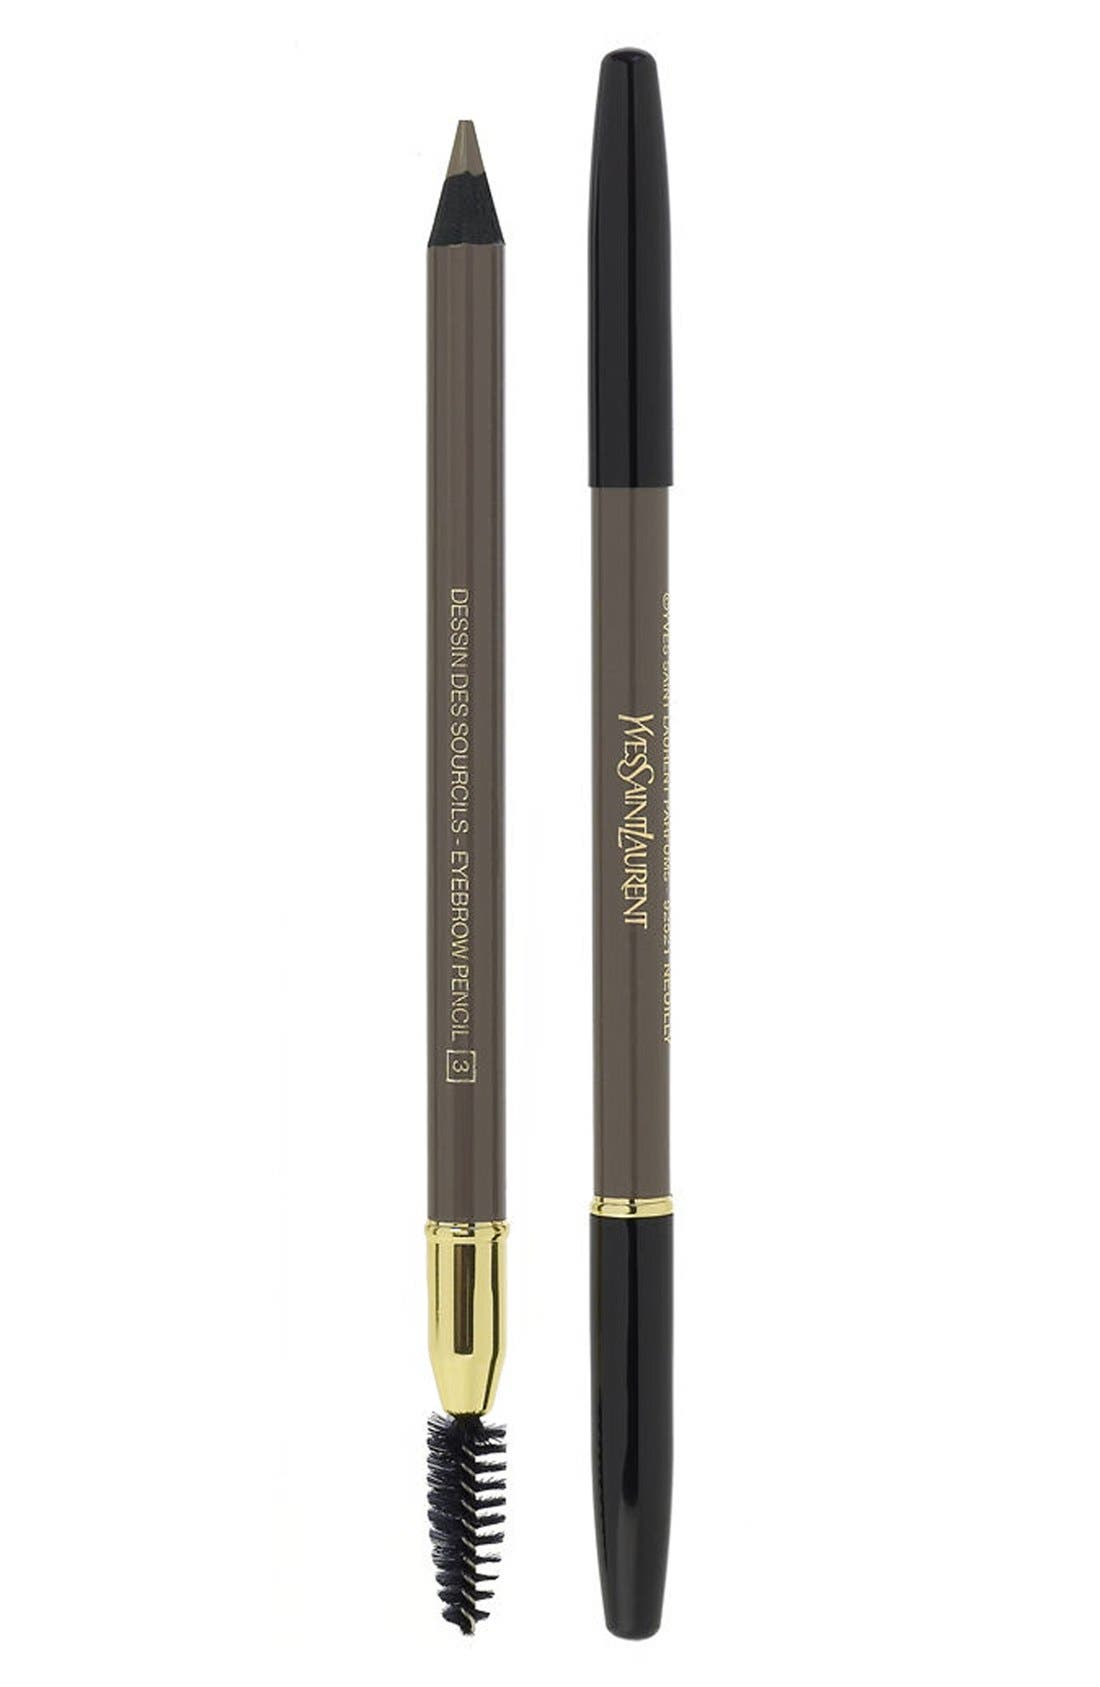 Yves Saint Laurent Eyebrow Pencil - 004 Ash